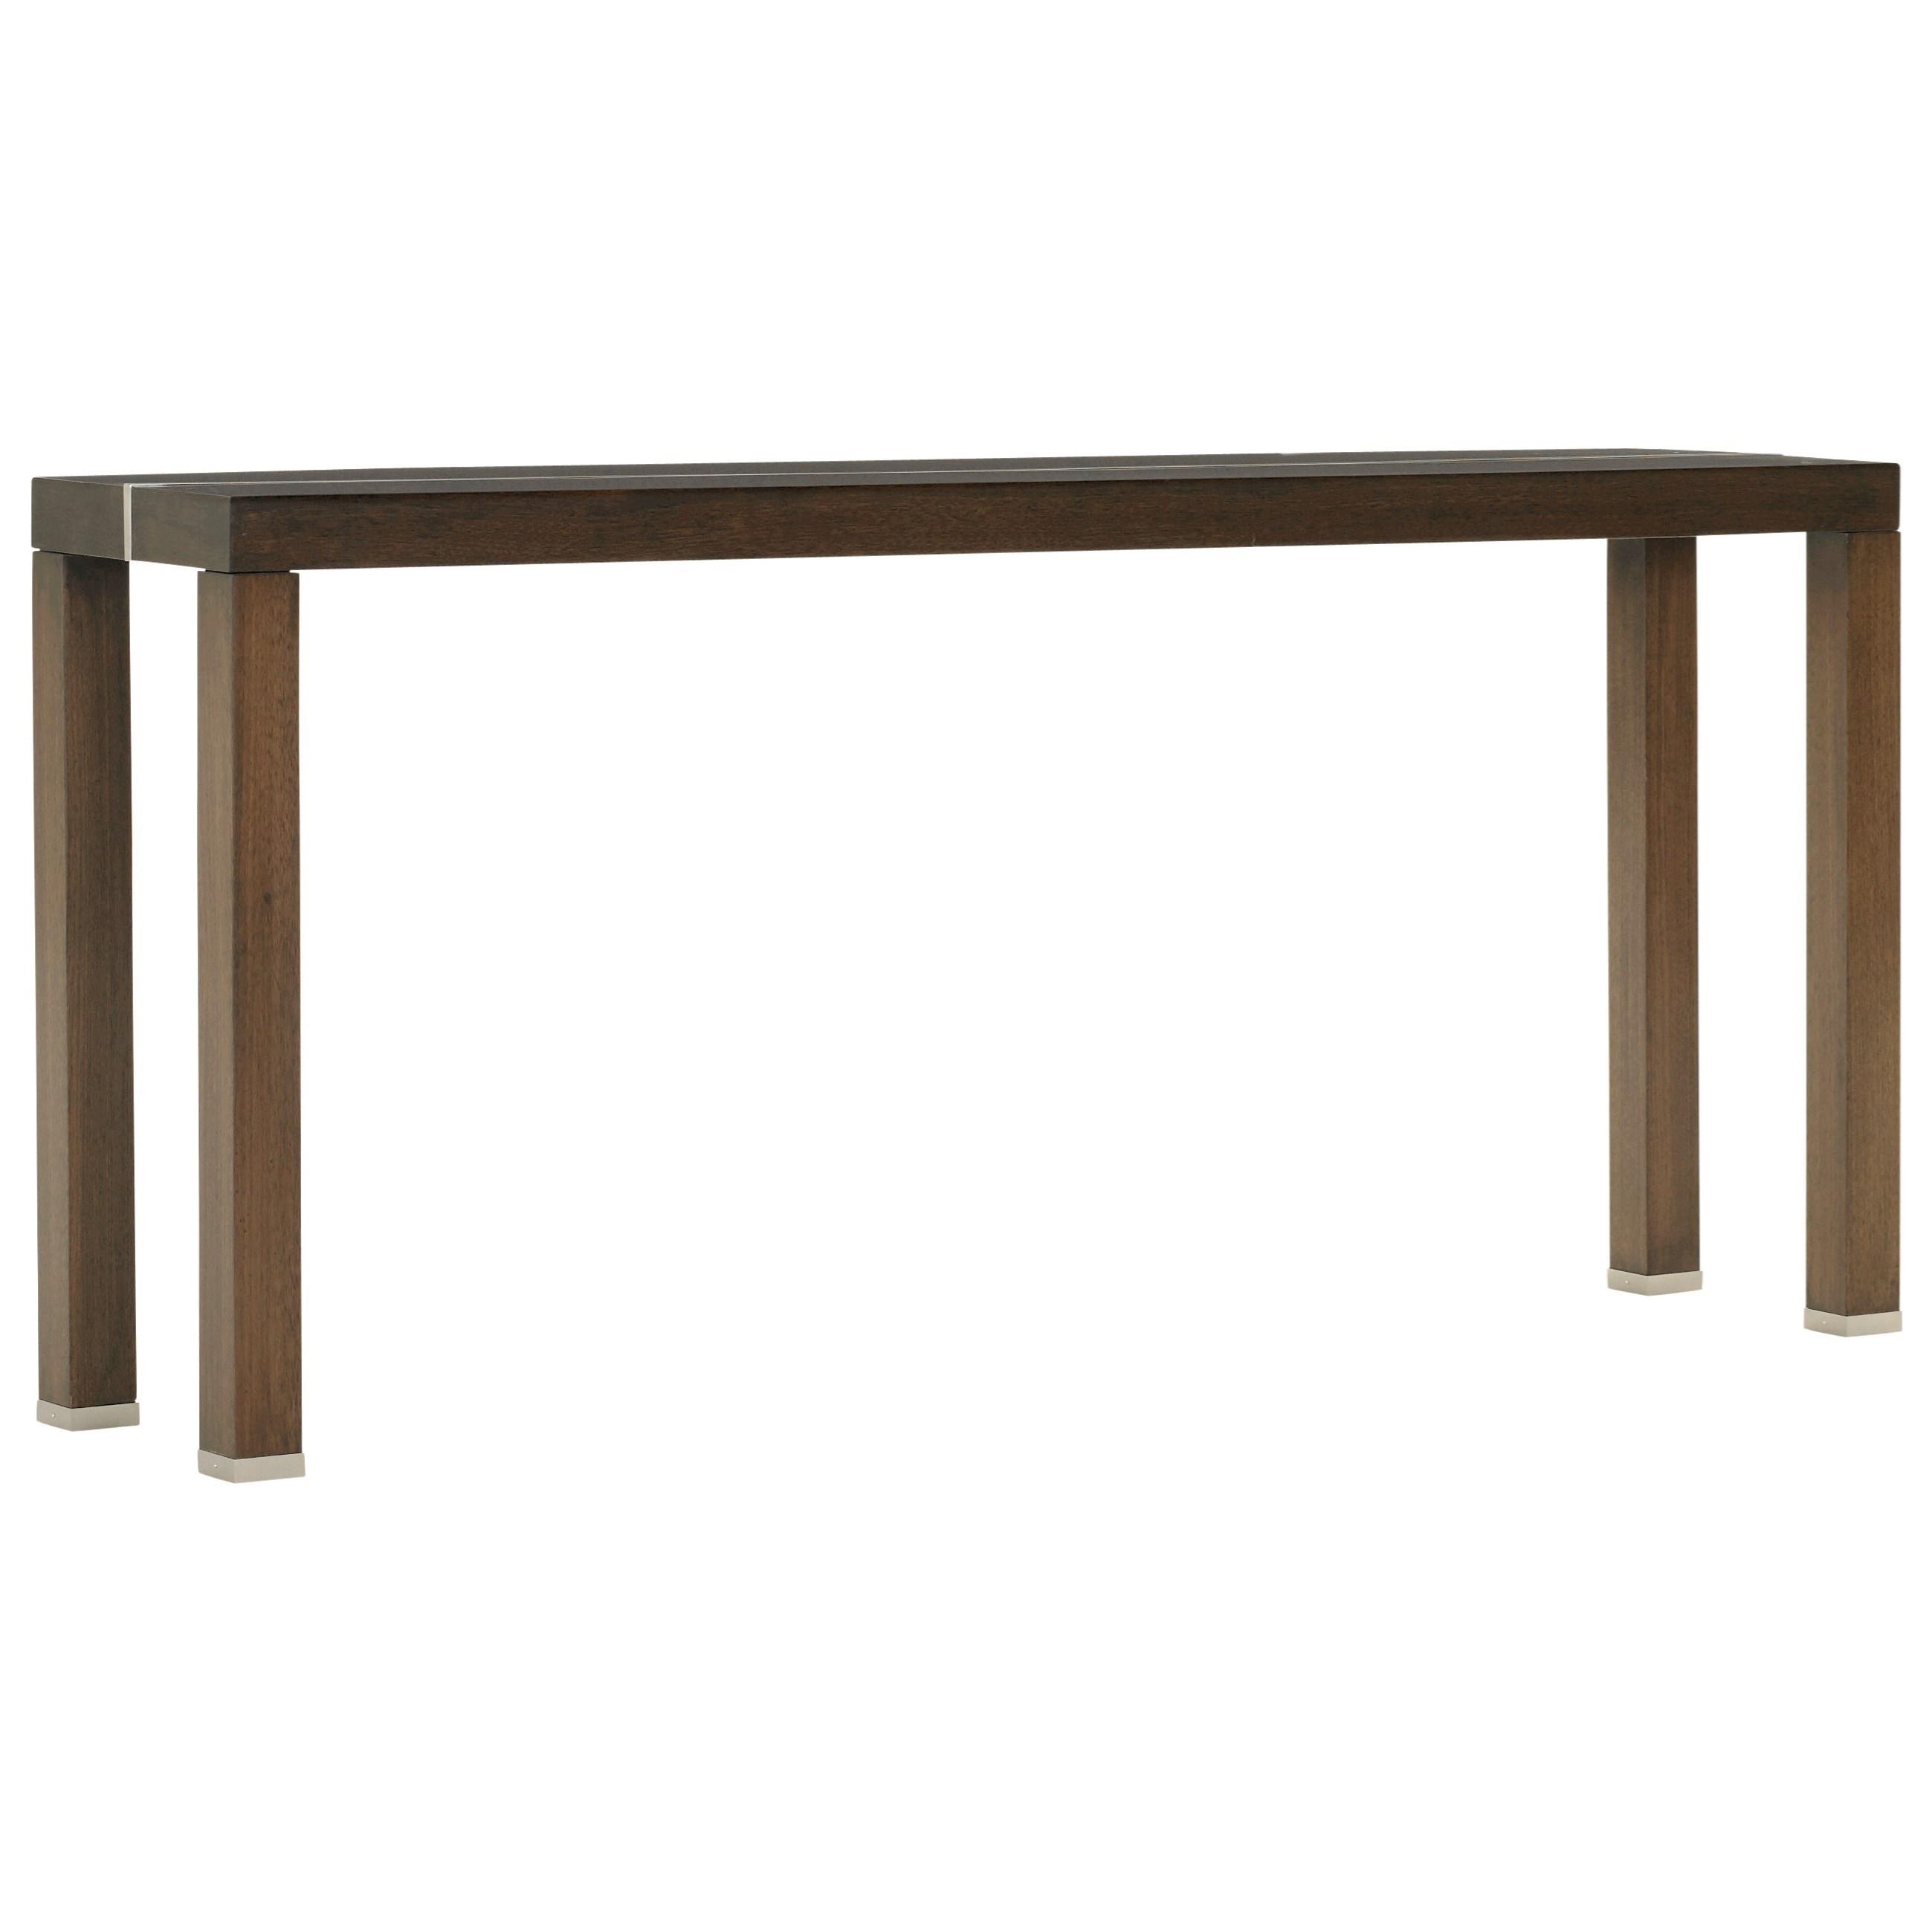 MacArthur Park Genoa Console Table by Lexington at Johnny Janosik